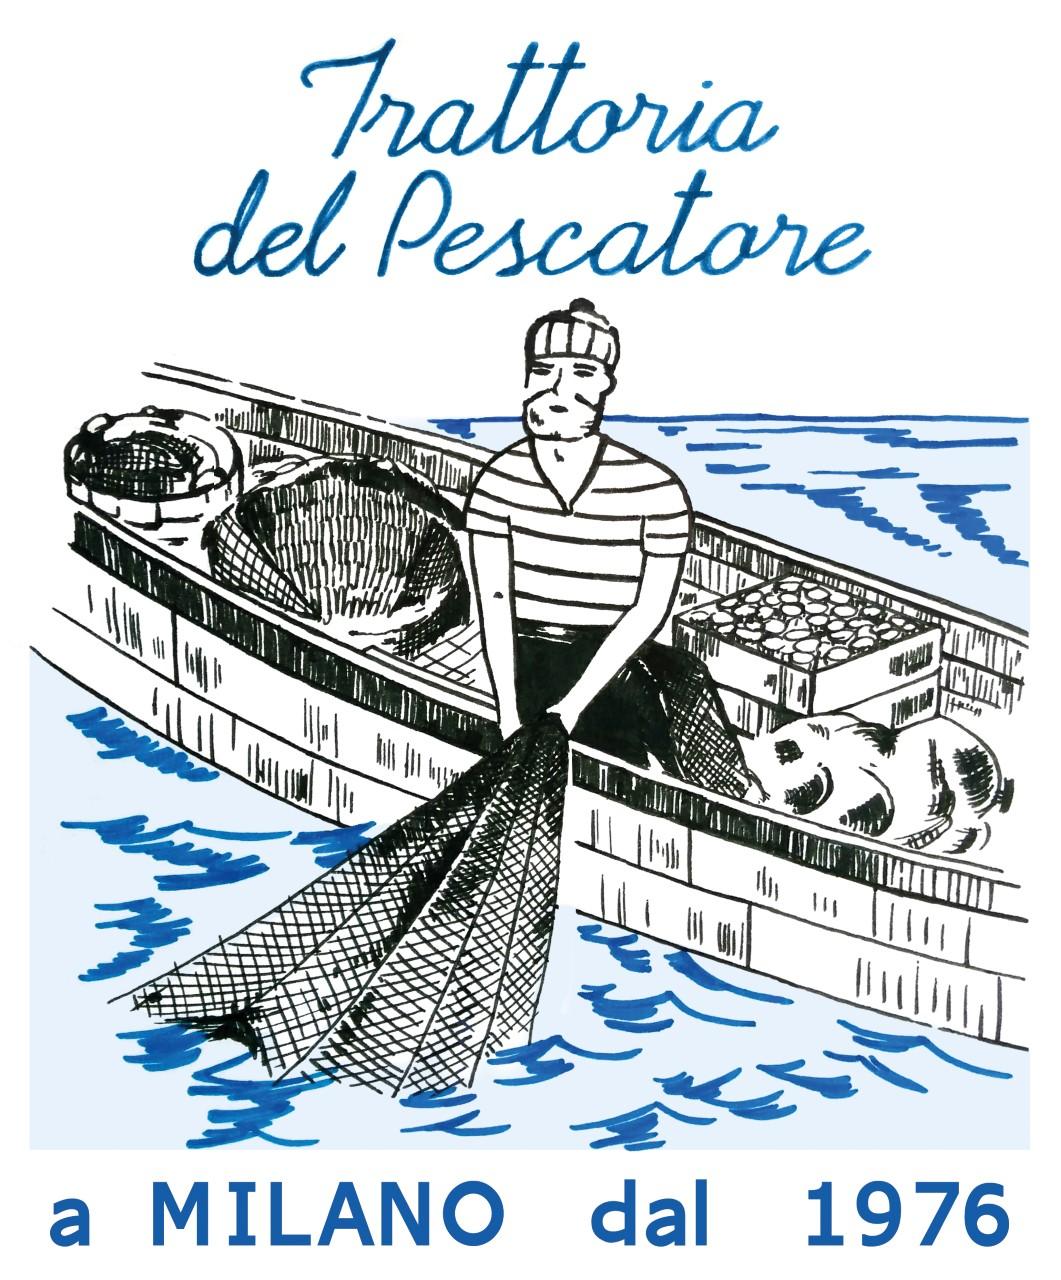 thumbnail_logo_Trattoria del Pescatore.jpg